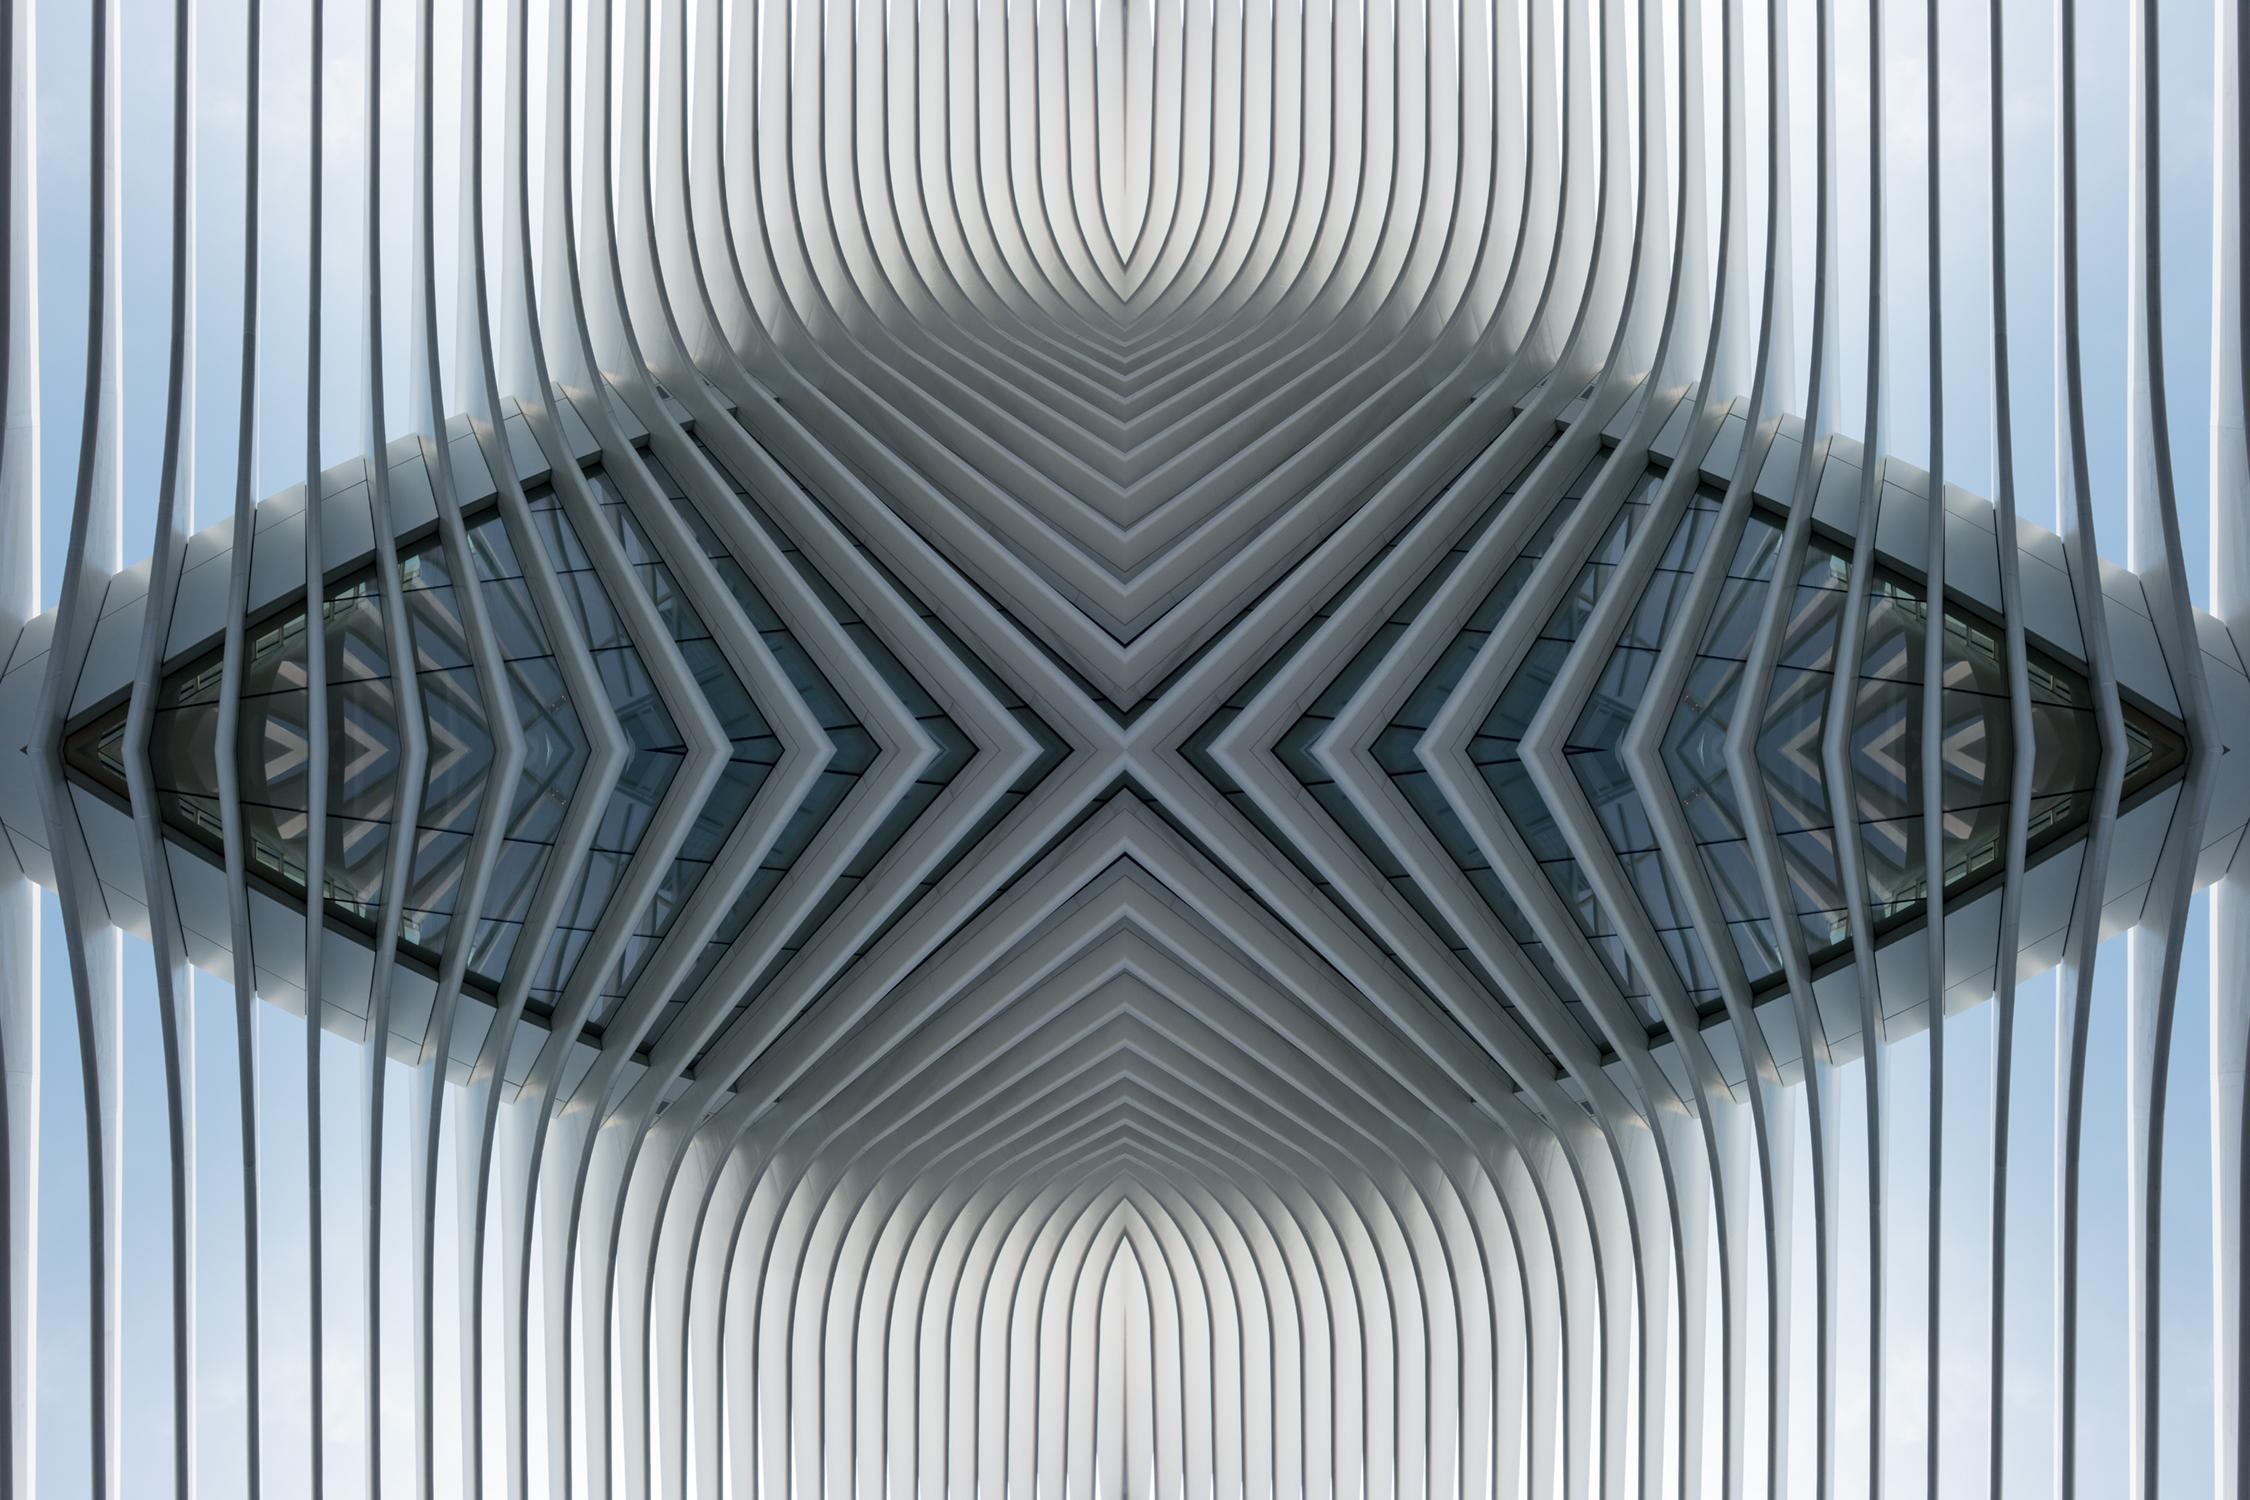 © ARCHITECTURE COMPOSITION No.14